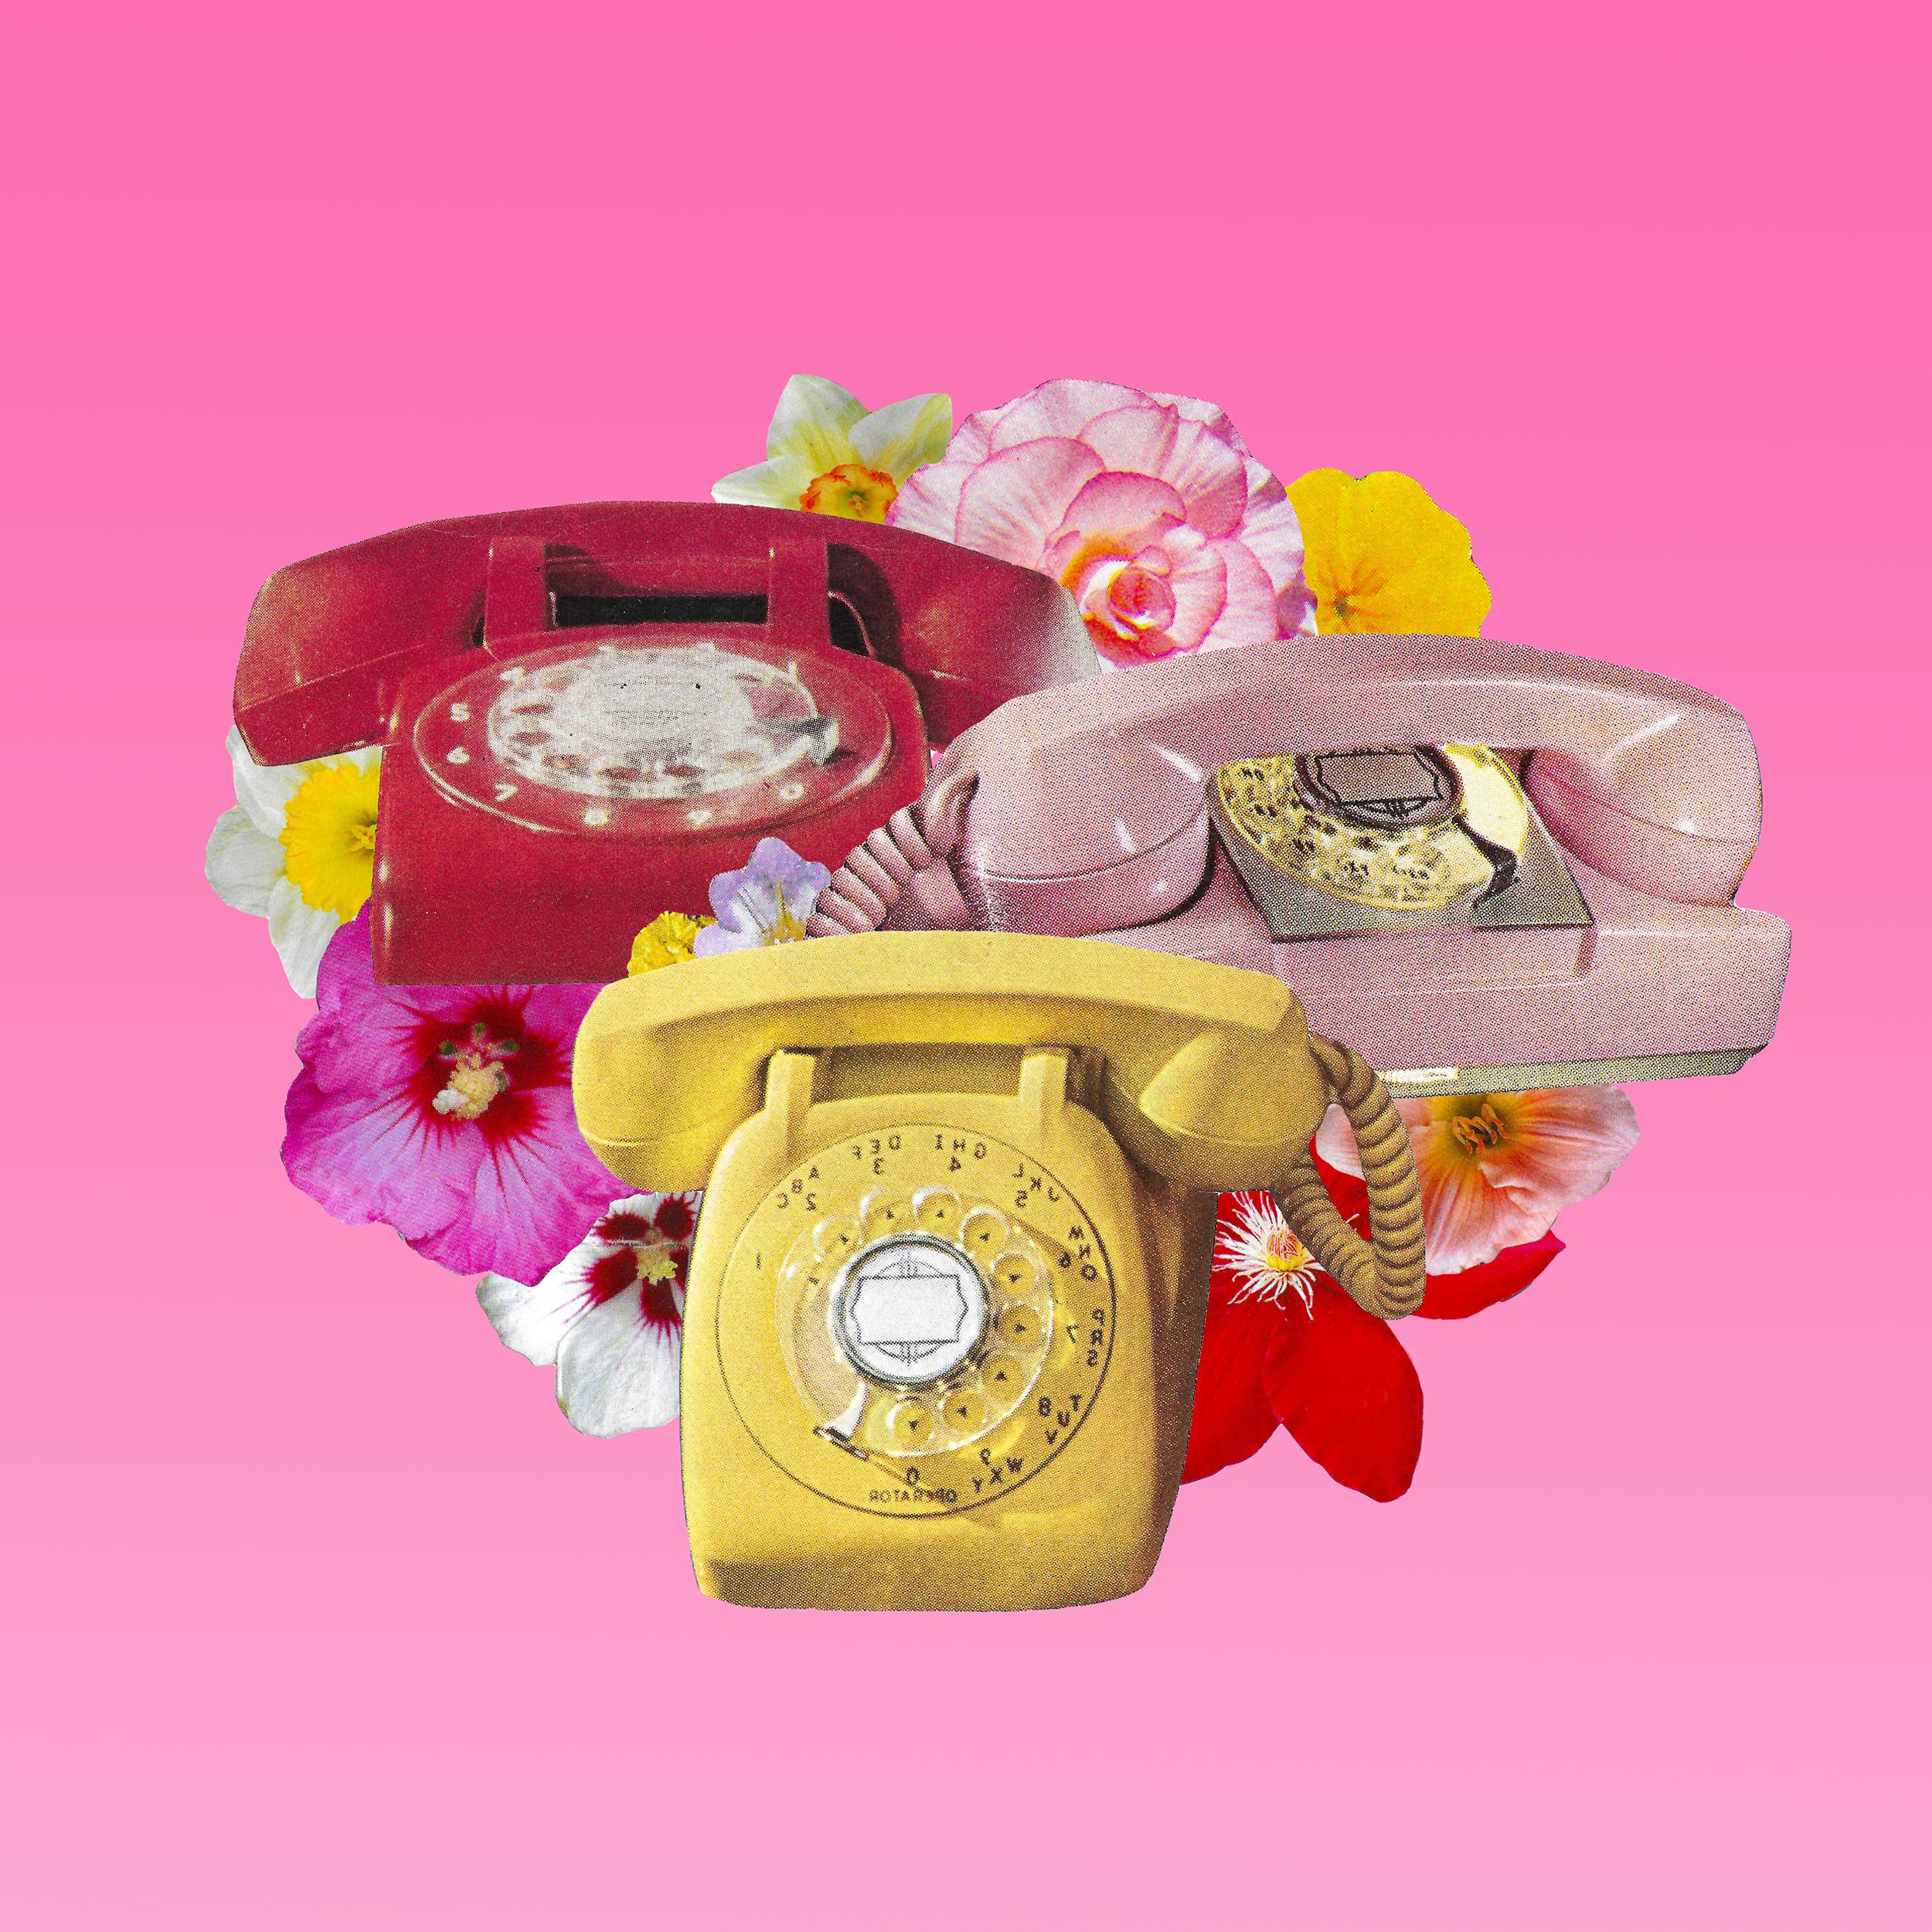 I'm Sorry for Calling. - Dug Dngr